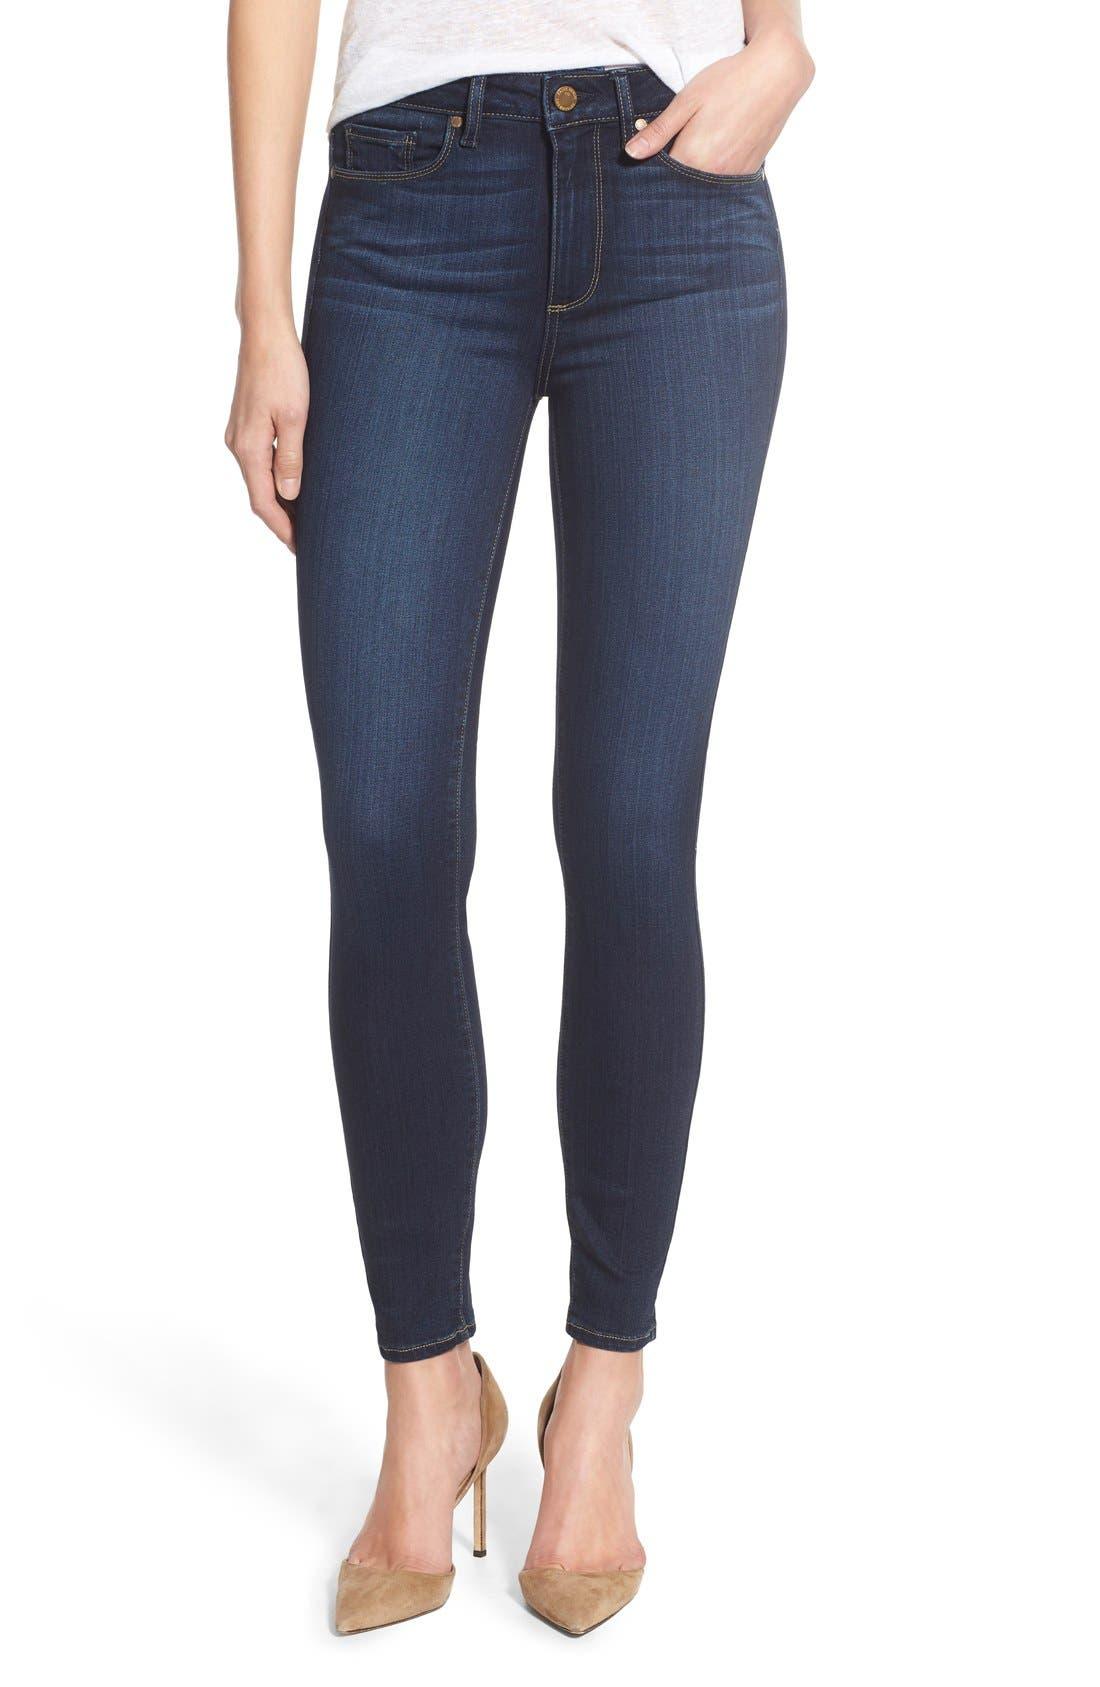 Transcend - Hoxton High Waist Ankle Ultra Skinny Jeans,                         Main,                         color, HARTMANN